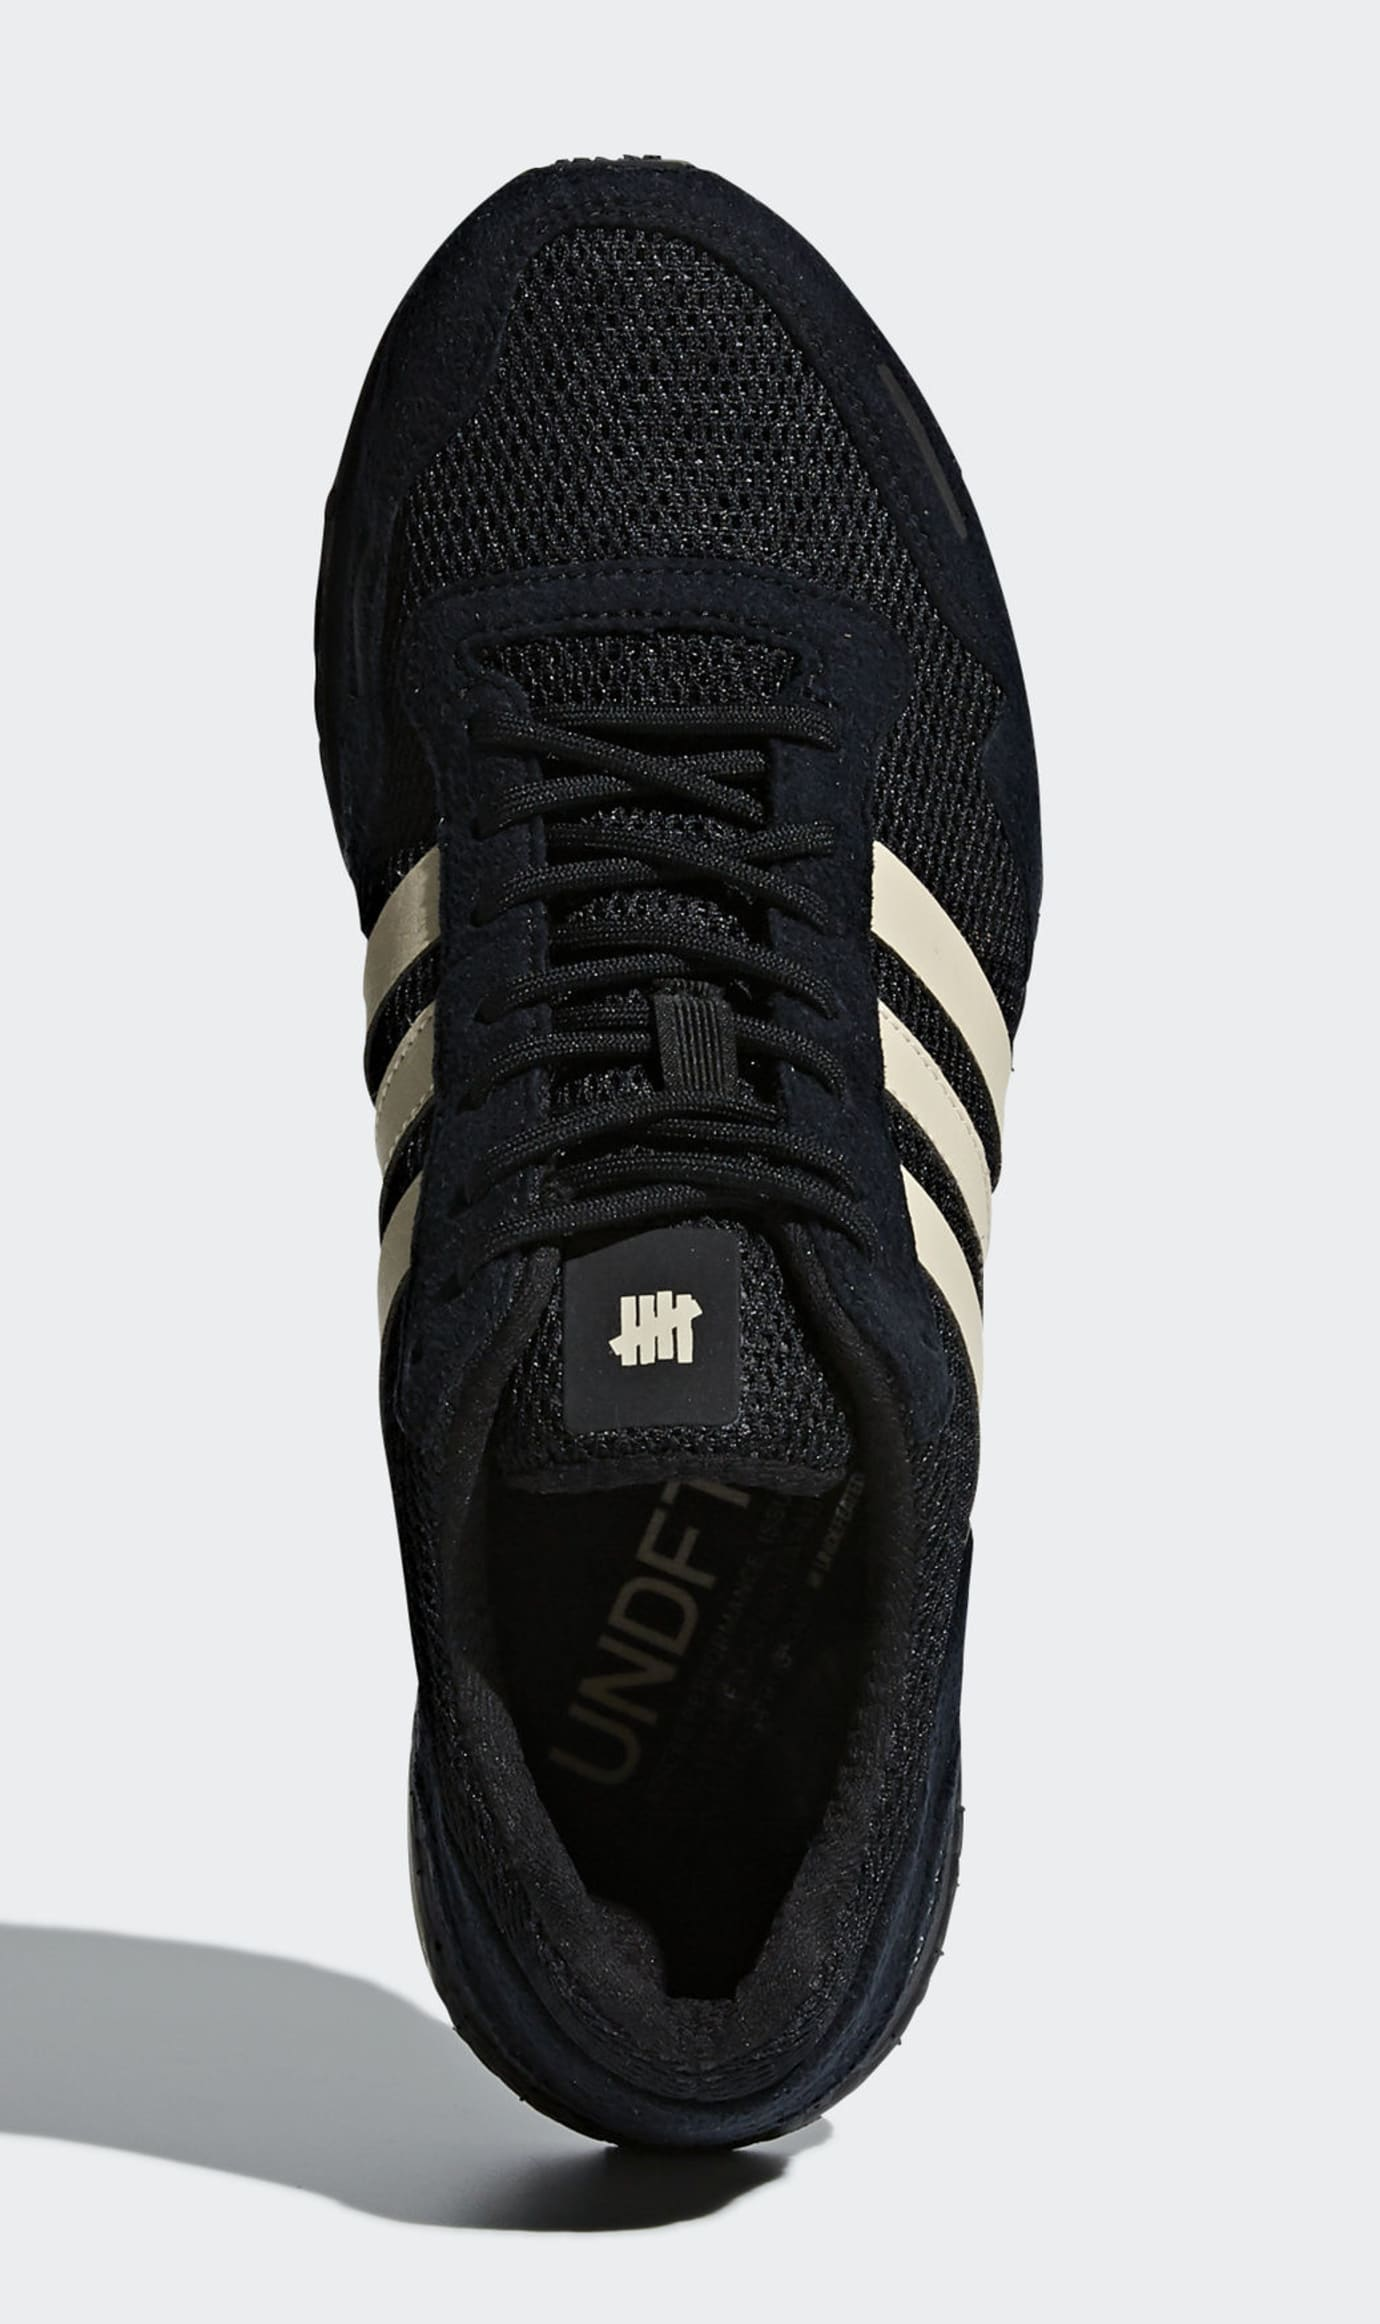 huge discount 438e0 07709 Image via Adidas Undefeated x Adidas Adizero Adios 3 B22483 (Top)